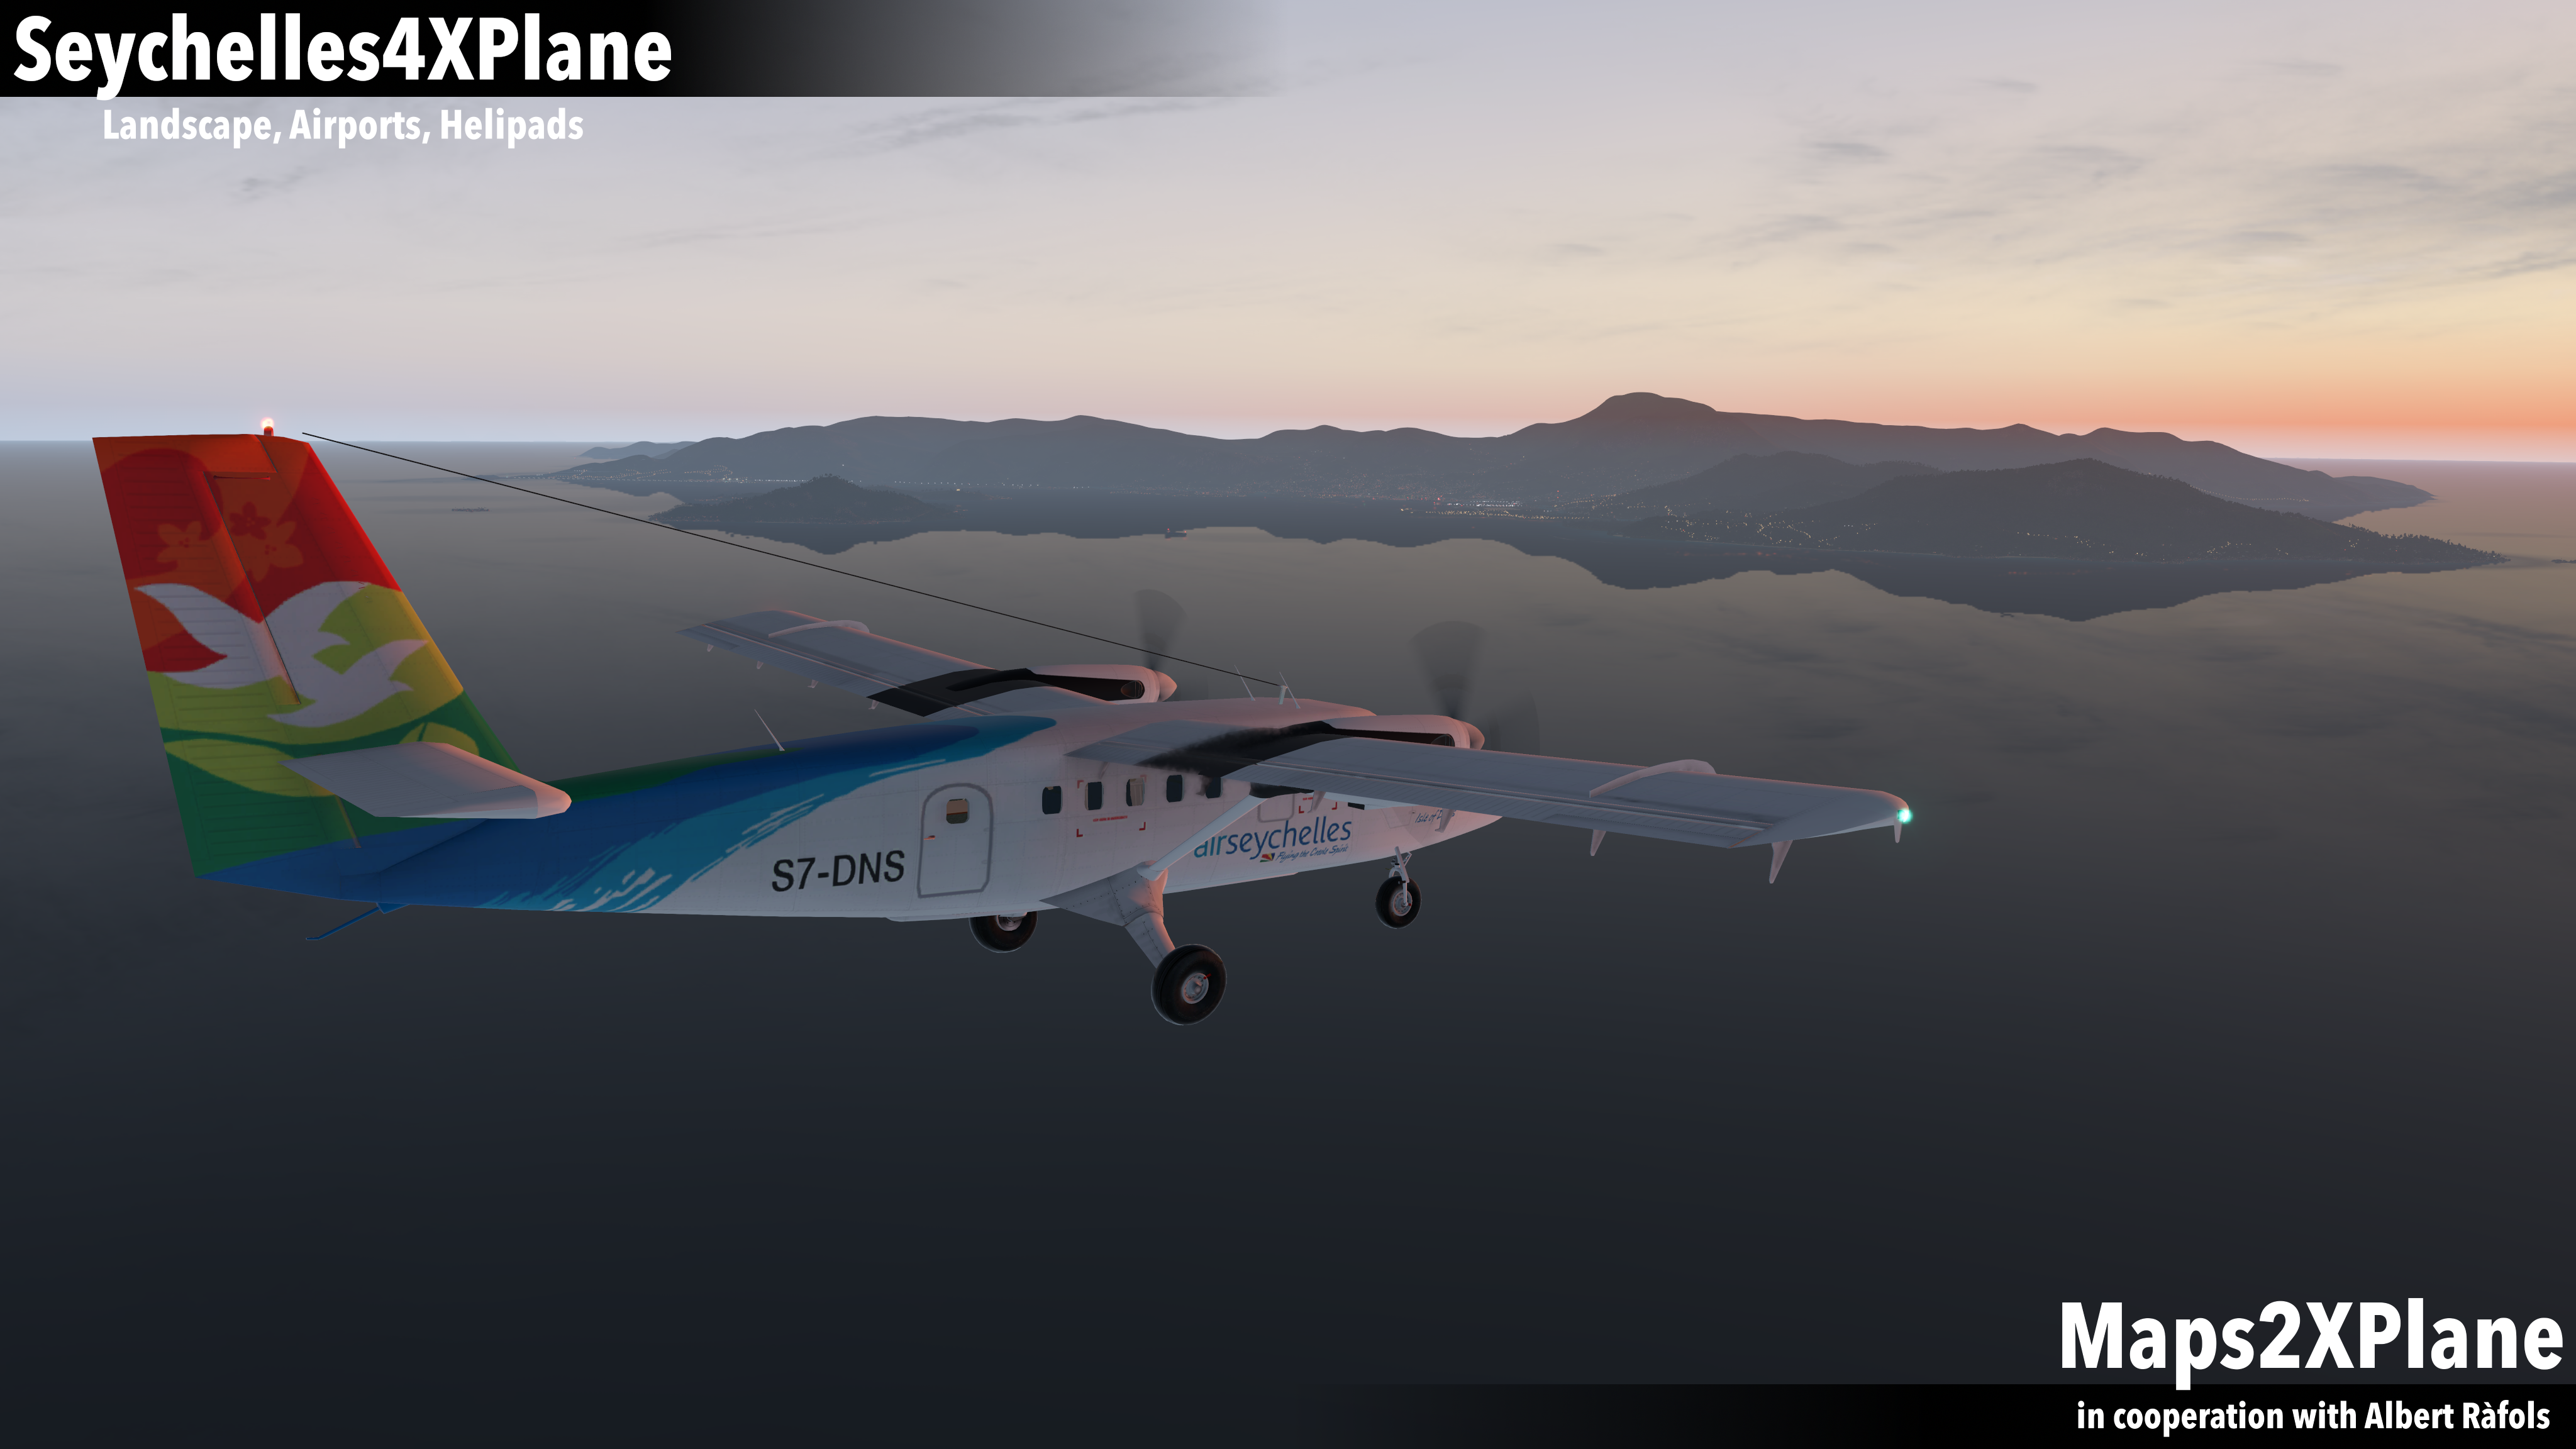 seychelles4xplane_mesh_01.png